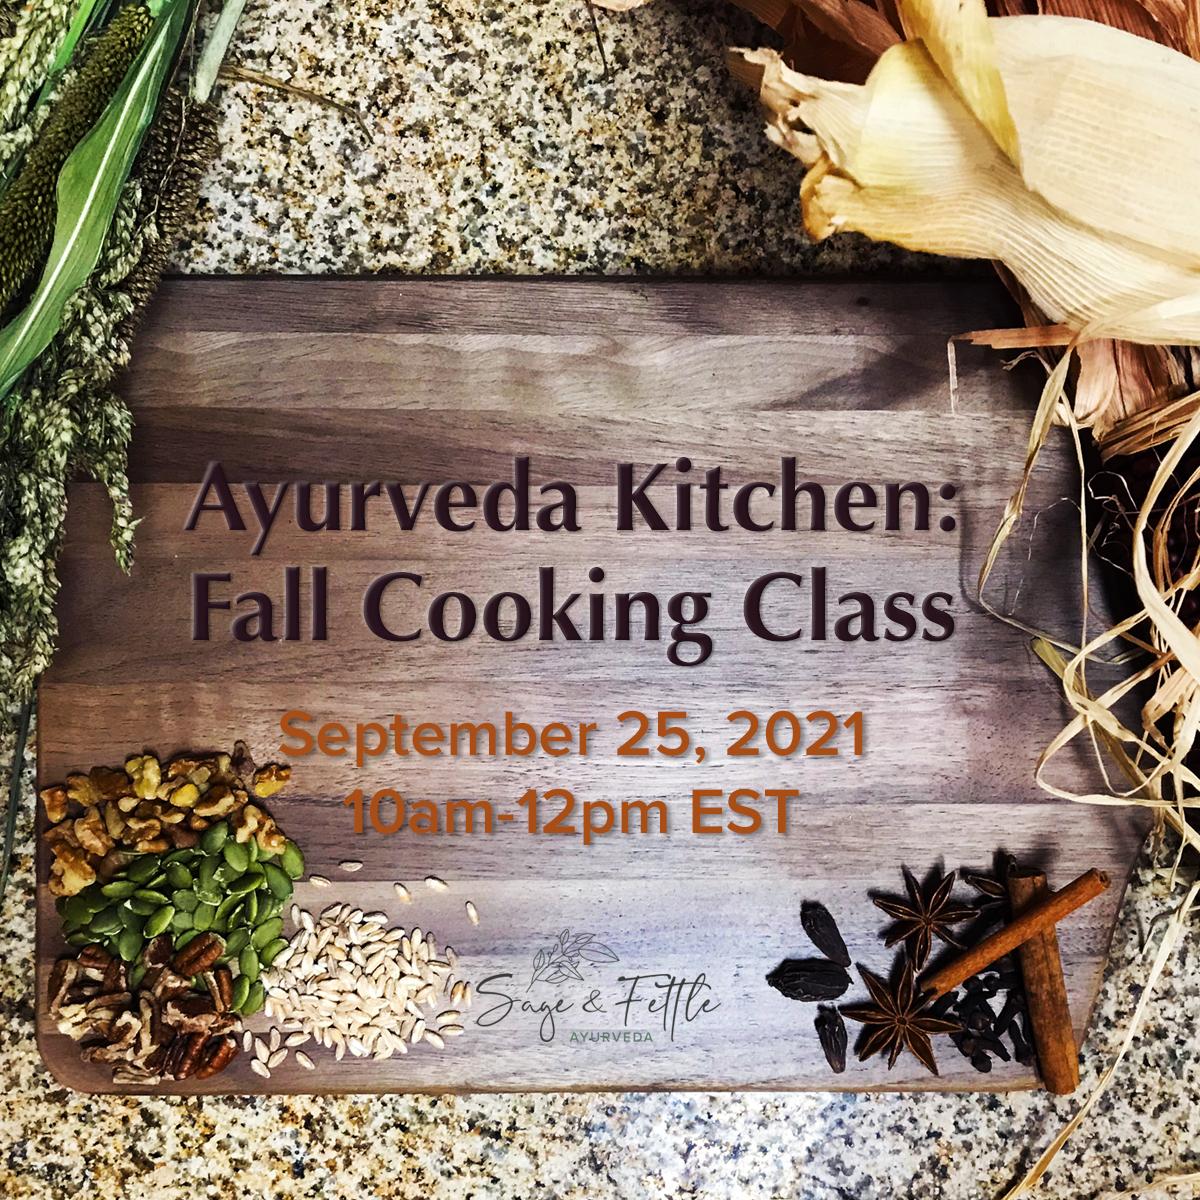 Fall Ayurveda Cooking Class September 15, 2021 with Angelina Fox, ERYT500, YACEP, Yoga Teacher and Ayurveda Health Counselor